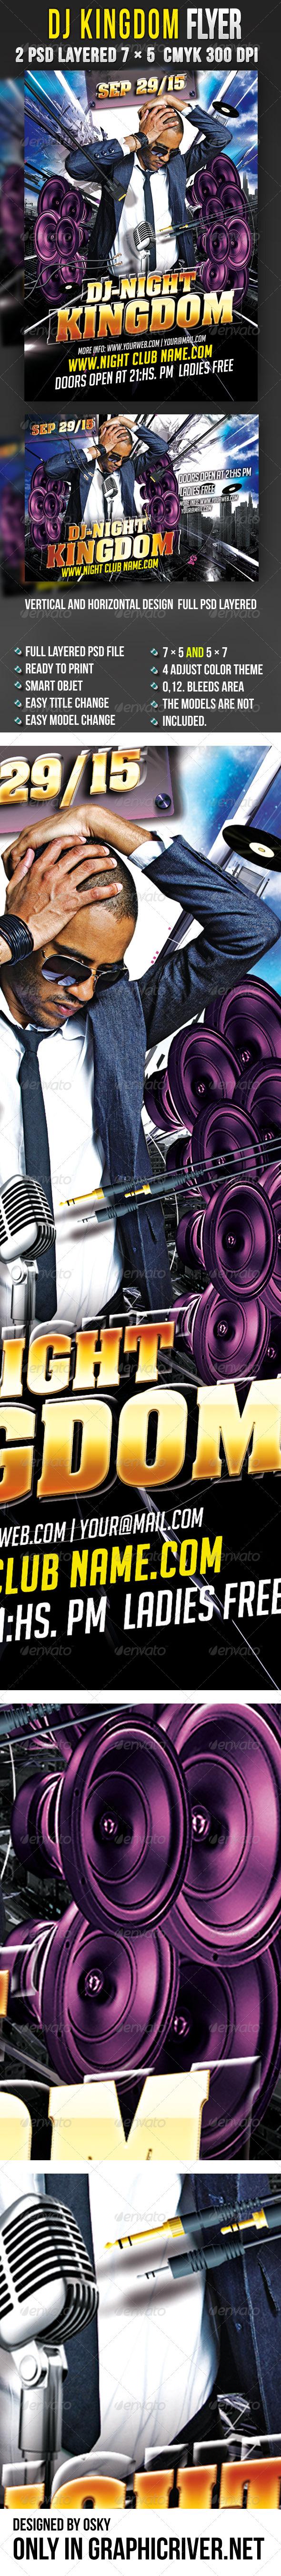 GraphicRiver DJ Kingdom Flyer 2997672